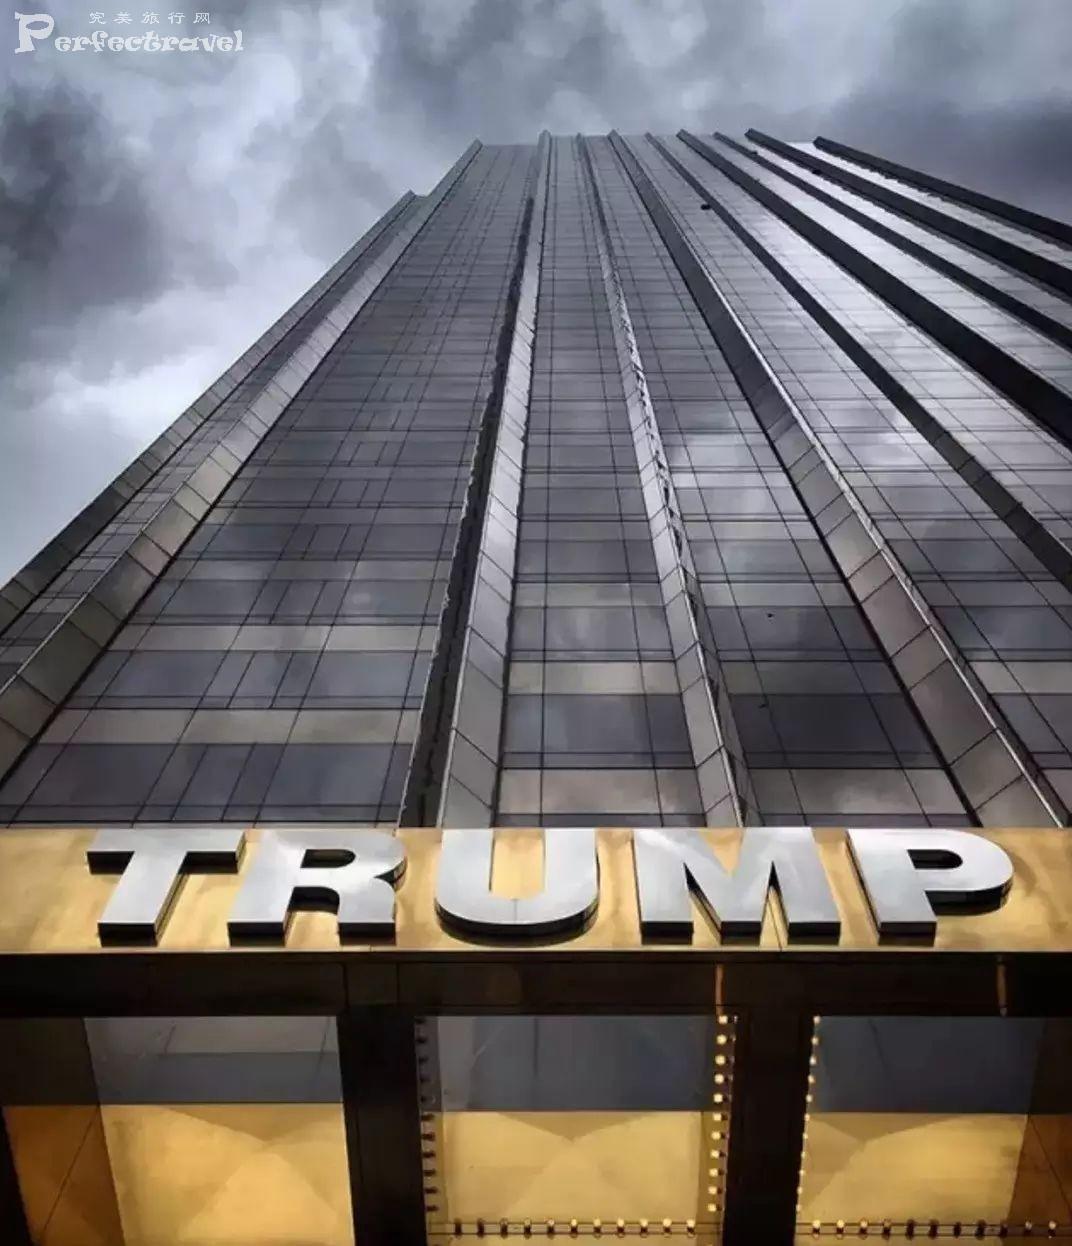 Trump集团酒店的正确打开方式  | Trump尊贵合作伙伴计划 - 完美旅行Perfectravel - 完美旅行Perfectravel的博客